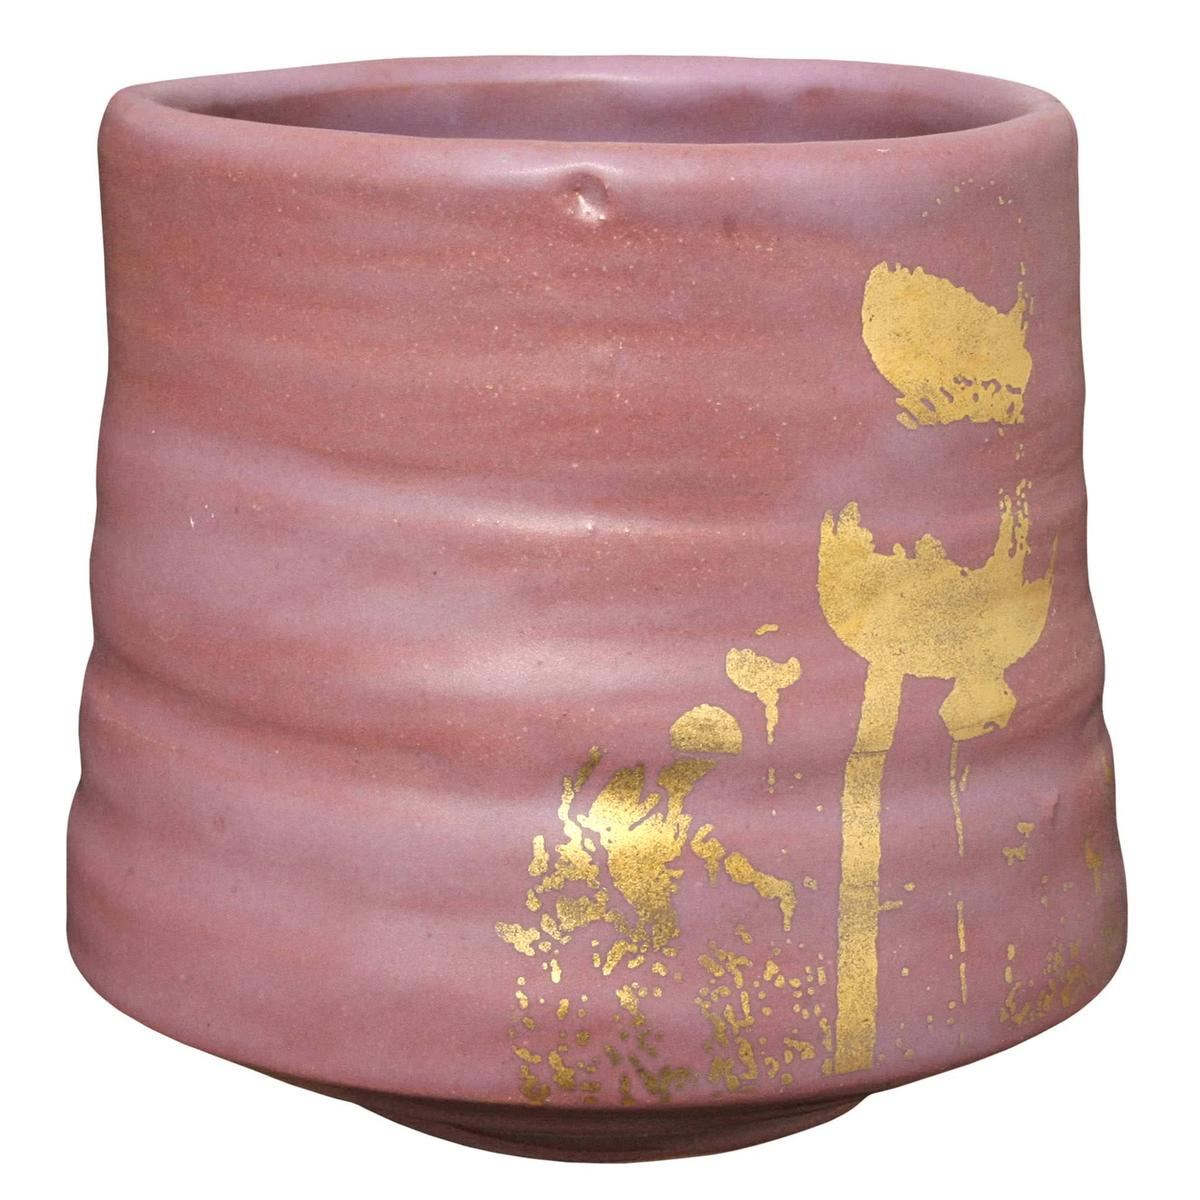 venta de esmalte para cerámica amaco Low Fire Matt Lm-53 orchid baja temperatura